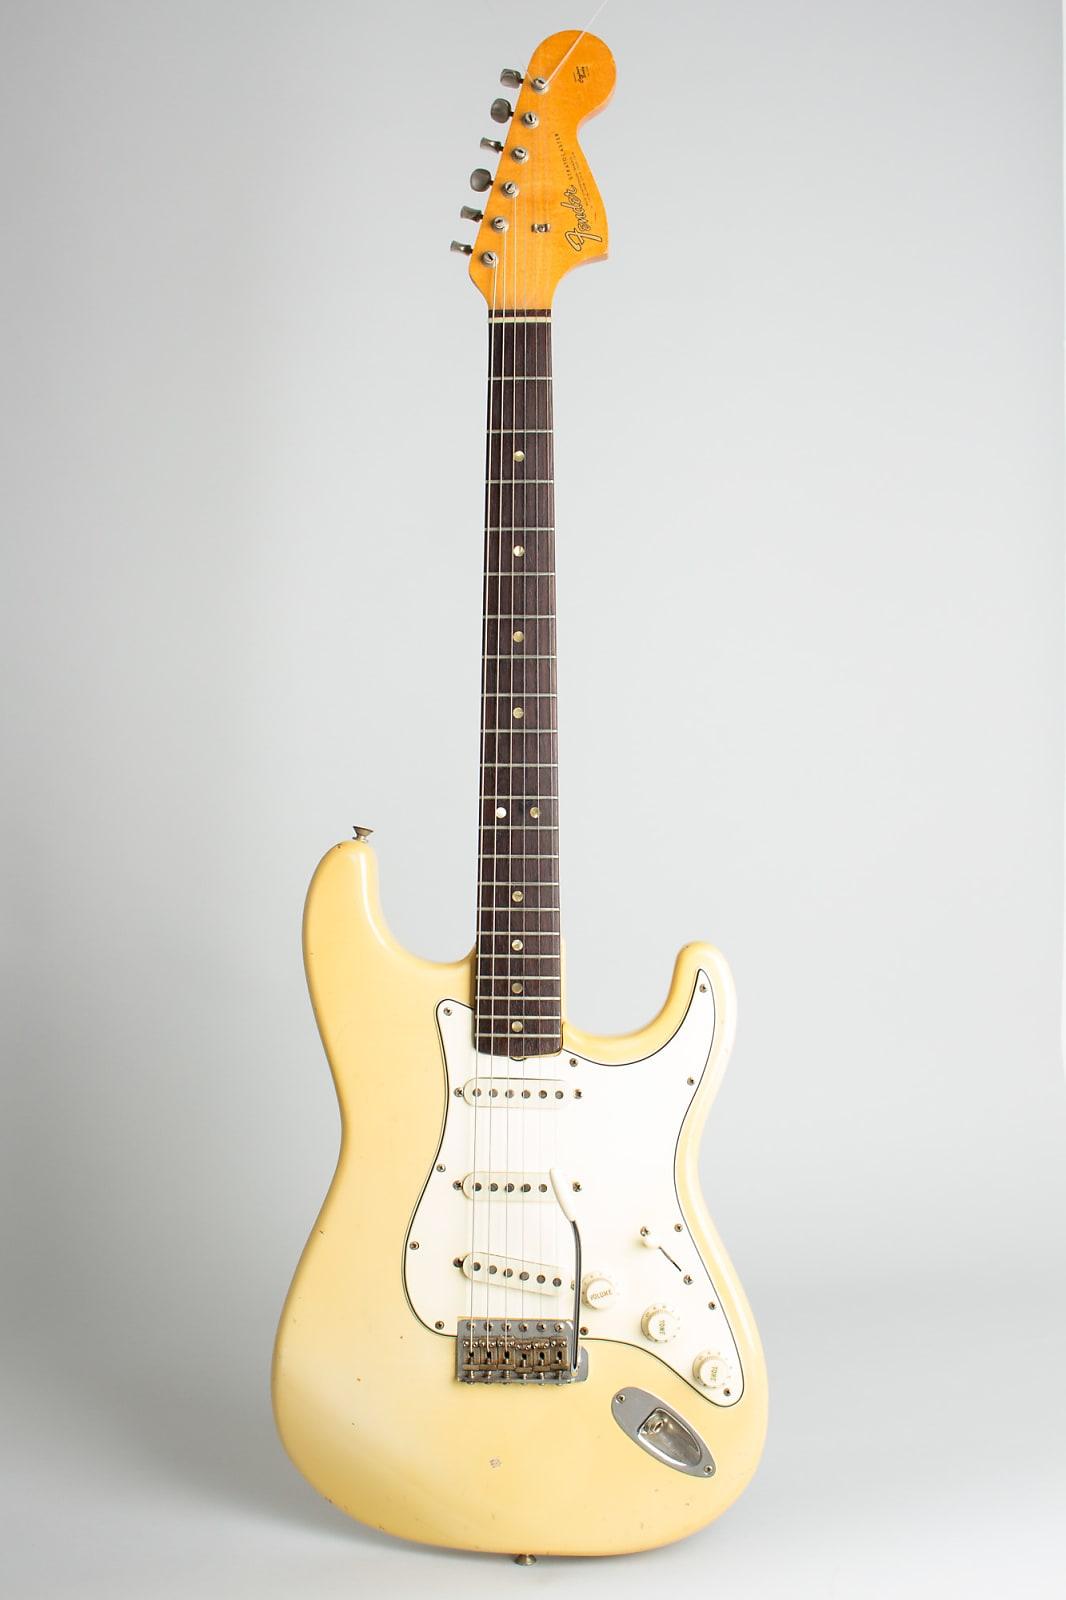 Fender  Stratocaster Solid Body Electric Guitar (1966), ser. #133536, original black tolex hard shell case.